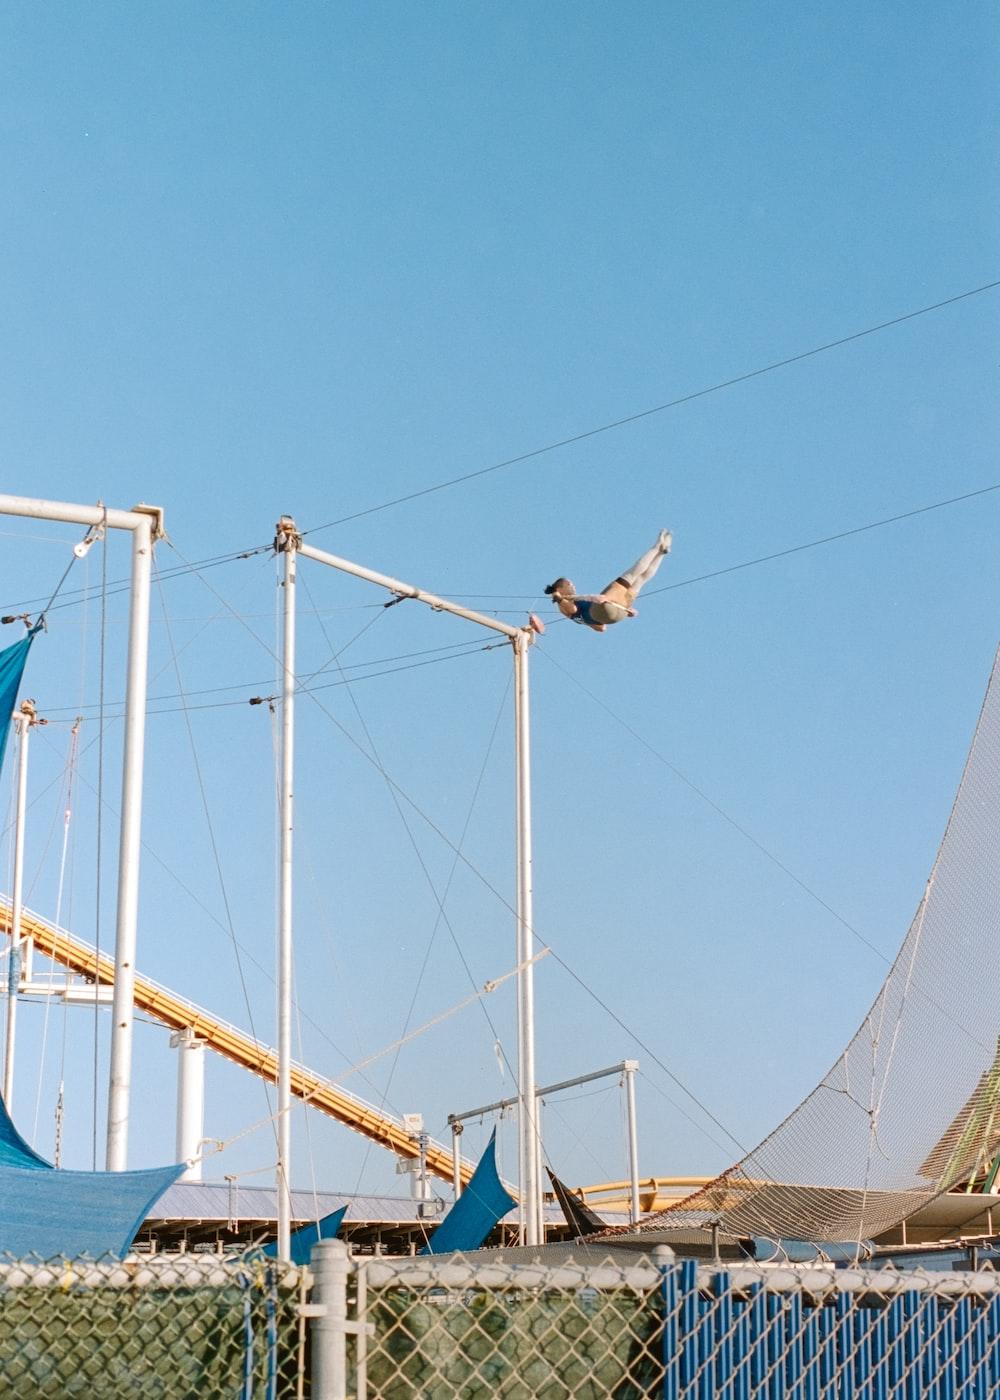 white and black bird flying over blue metal bridge during daytime